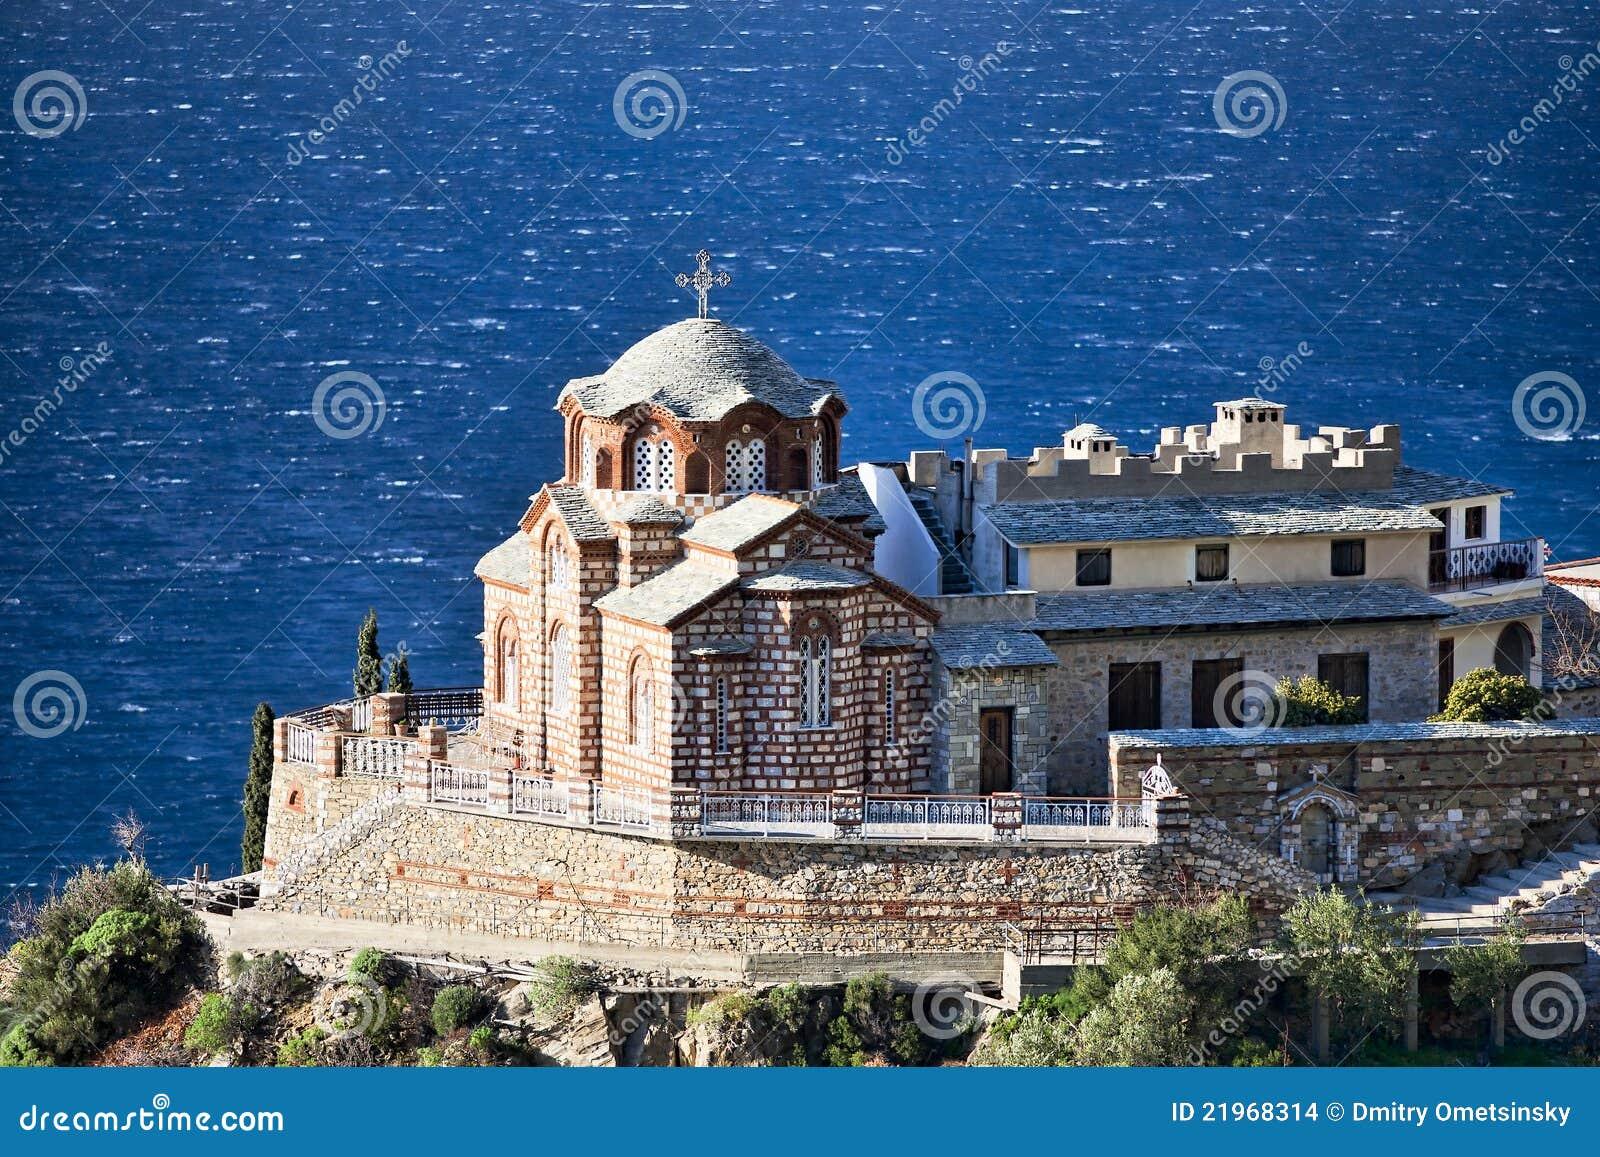 Greek Orthodox church above the sea on Mt. Athos